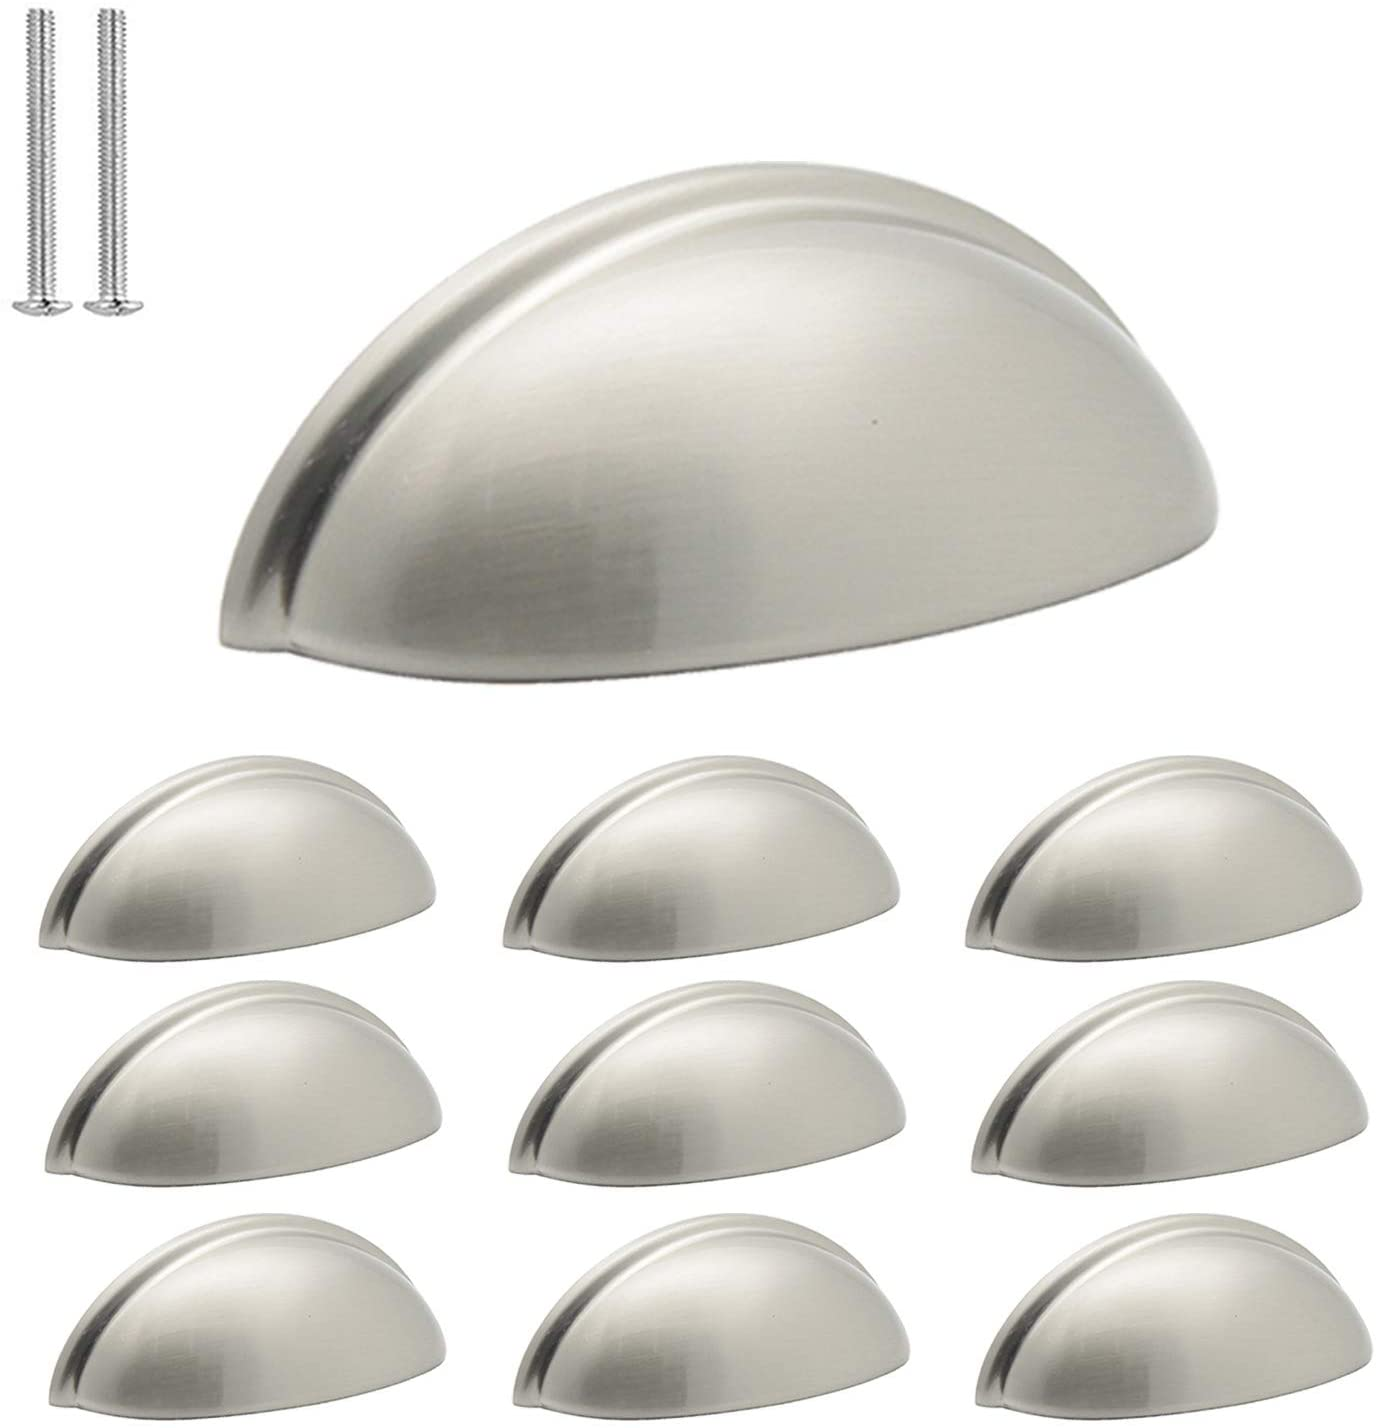 (10 Pack) Probrico Satin Nickel Drawer Handles Cabinet Cup Pulls 3 Inch Hole Center Kitchen Cabinet Hardware Bin Cup Cabinet Handles Modern Dresser Closet Handles Knobs